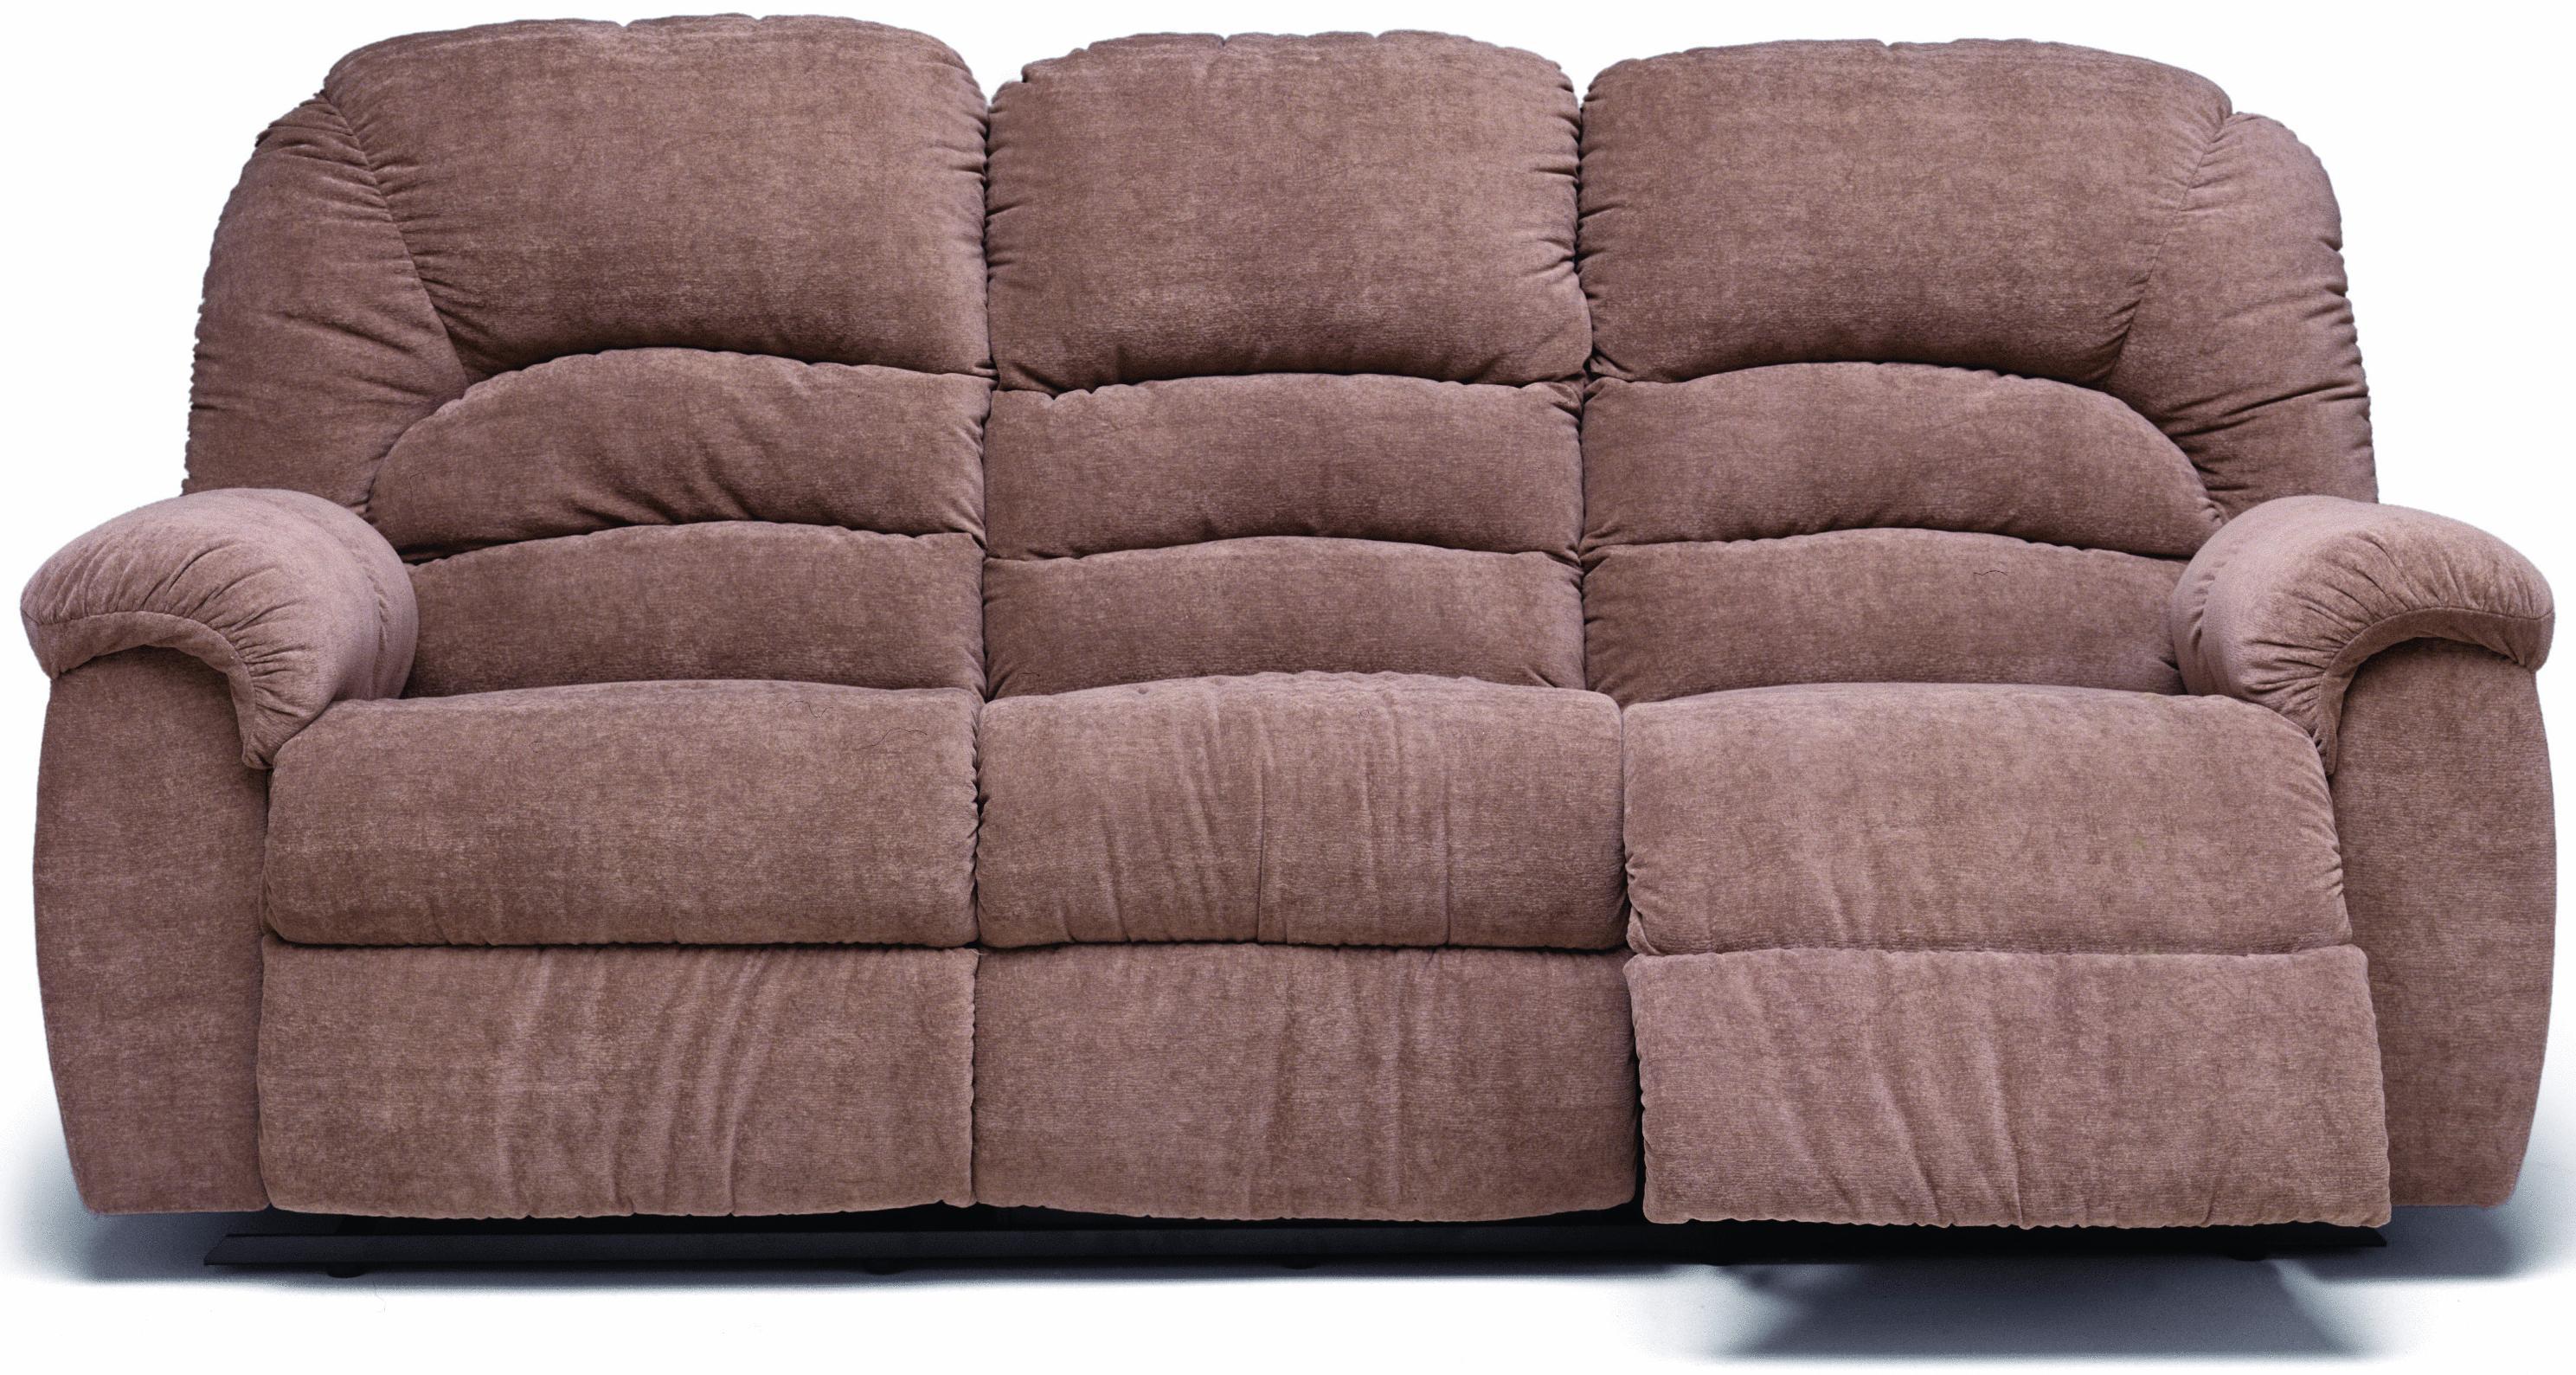 Palliser Taurus Casual Reclining Sofa With Center Drop